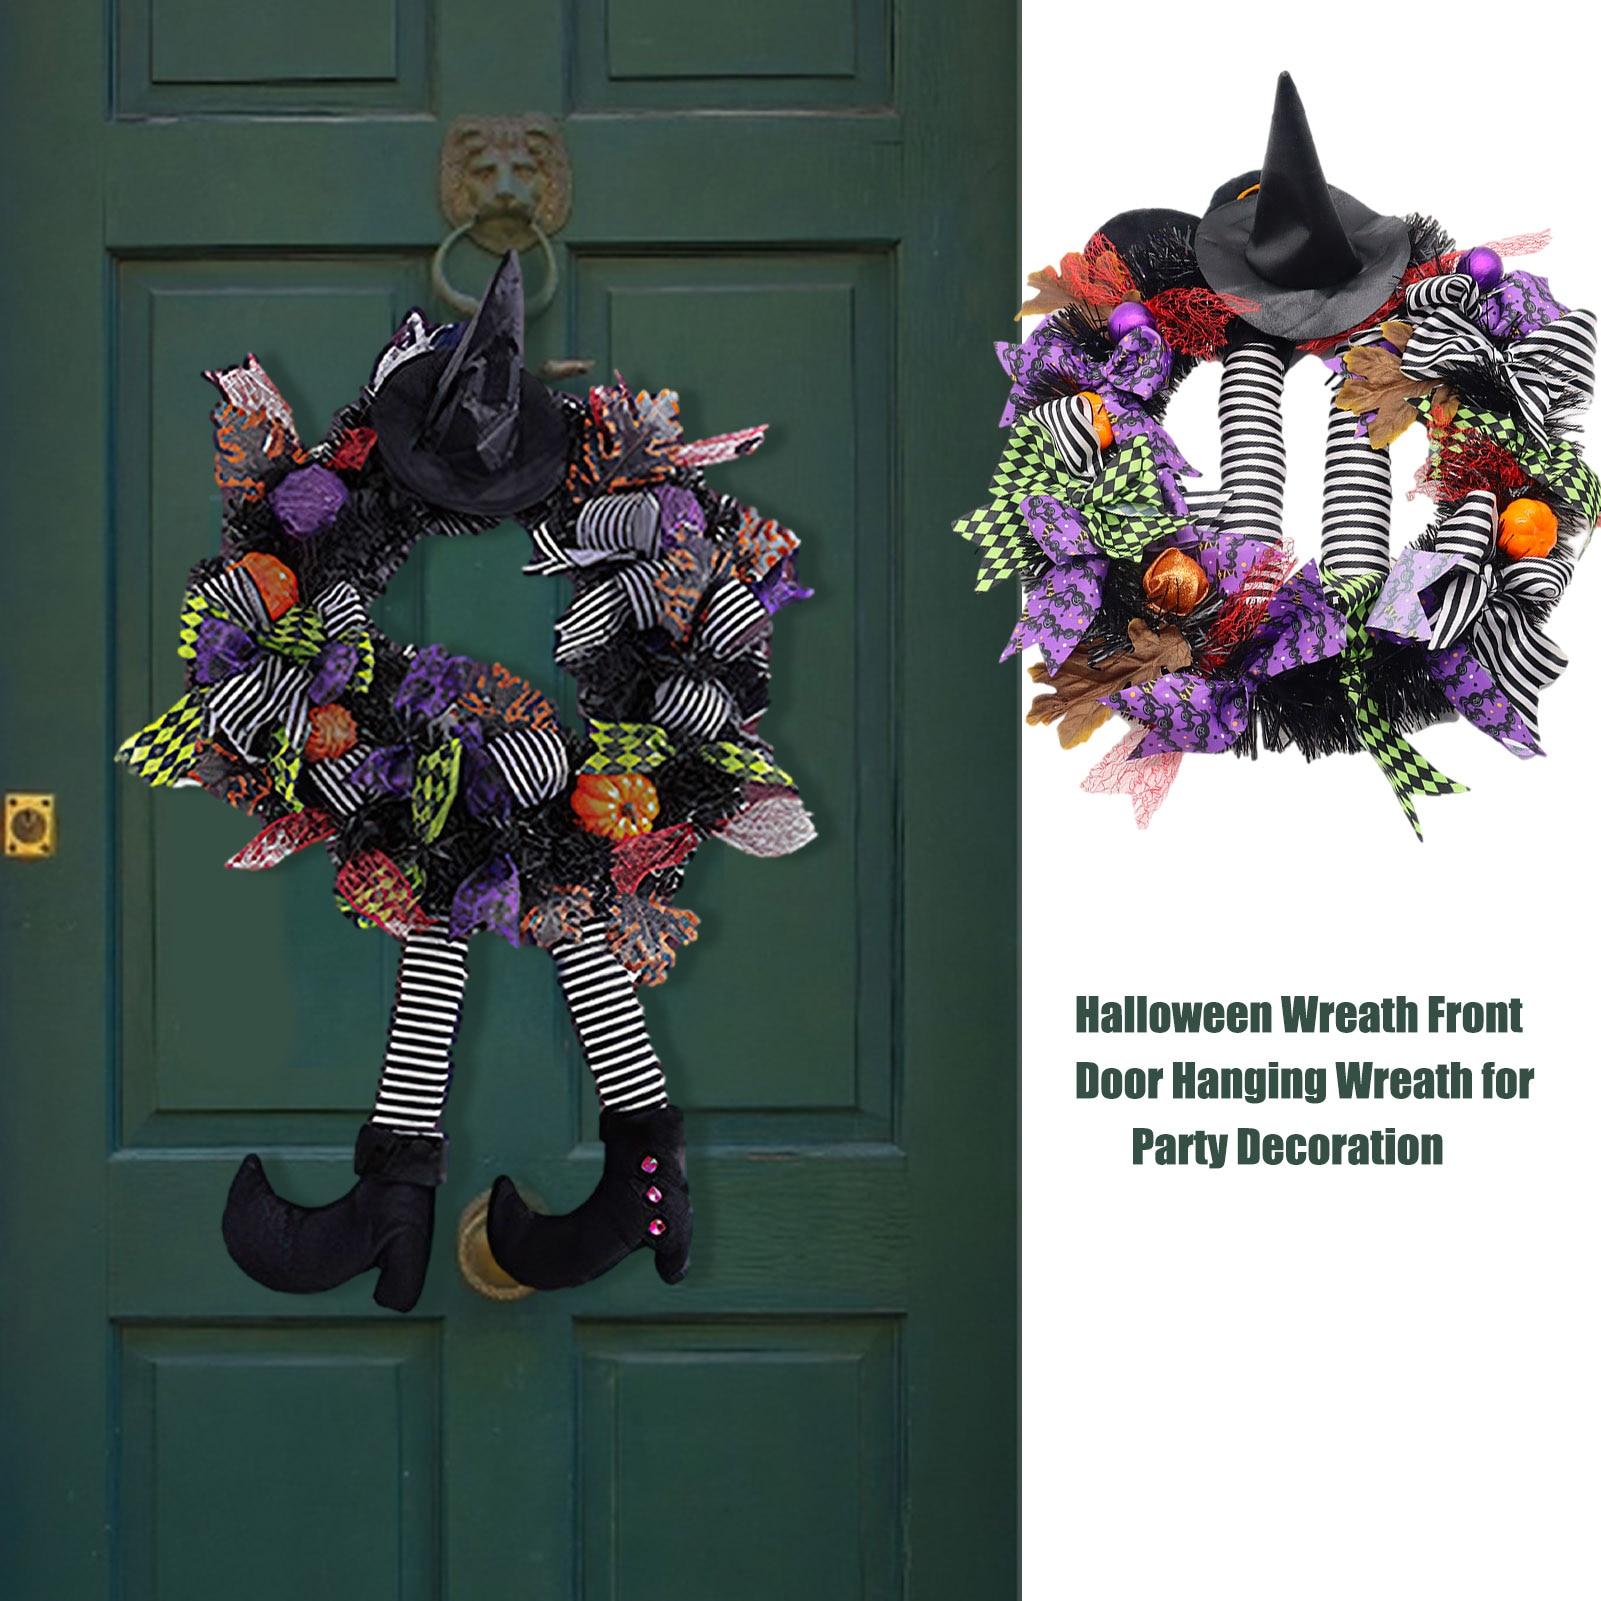 Halloween Front Door Hanging Garland Wreath Ornament Pumpkin Witch Hat Leg Wreath For Home Party Halloween Decoration #W0